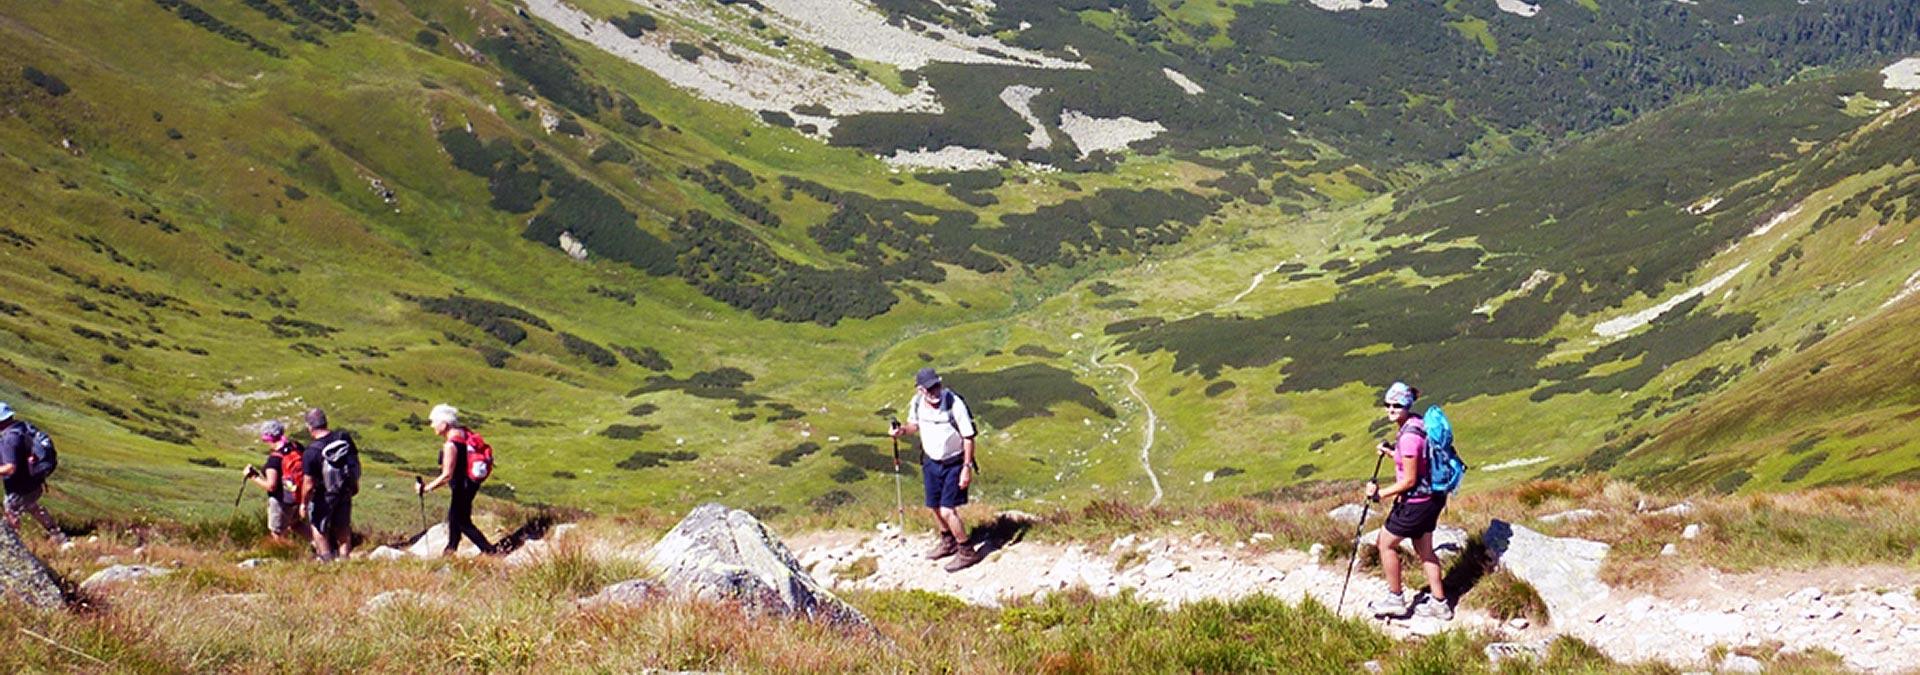 Explore Amazing Horehronie Region, Slovakia Travel, Location